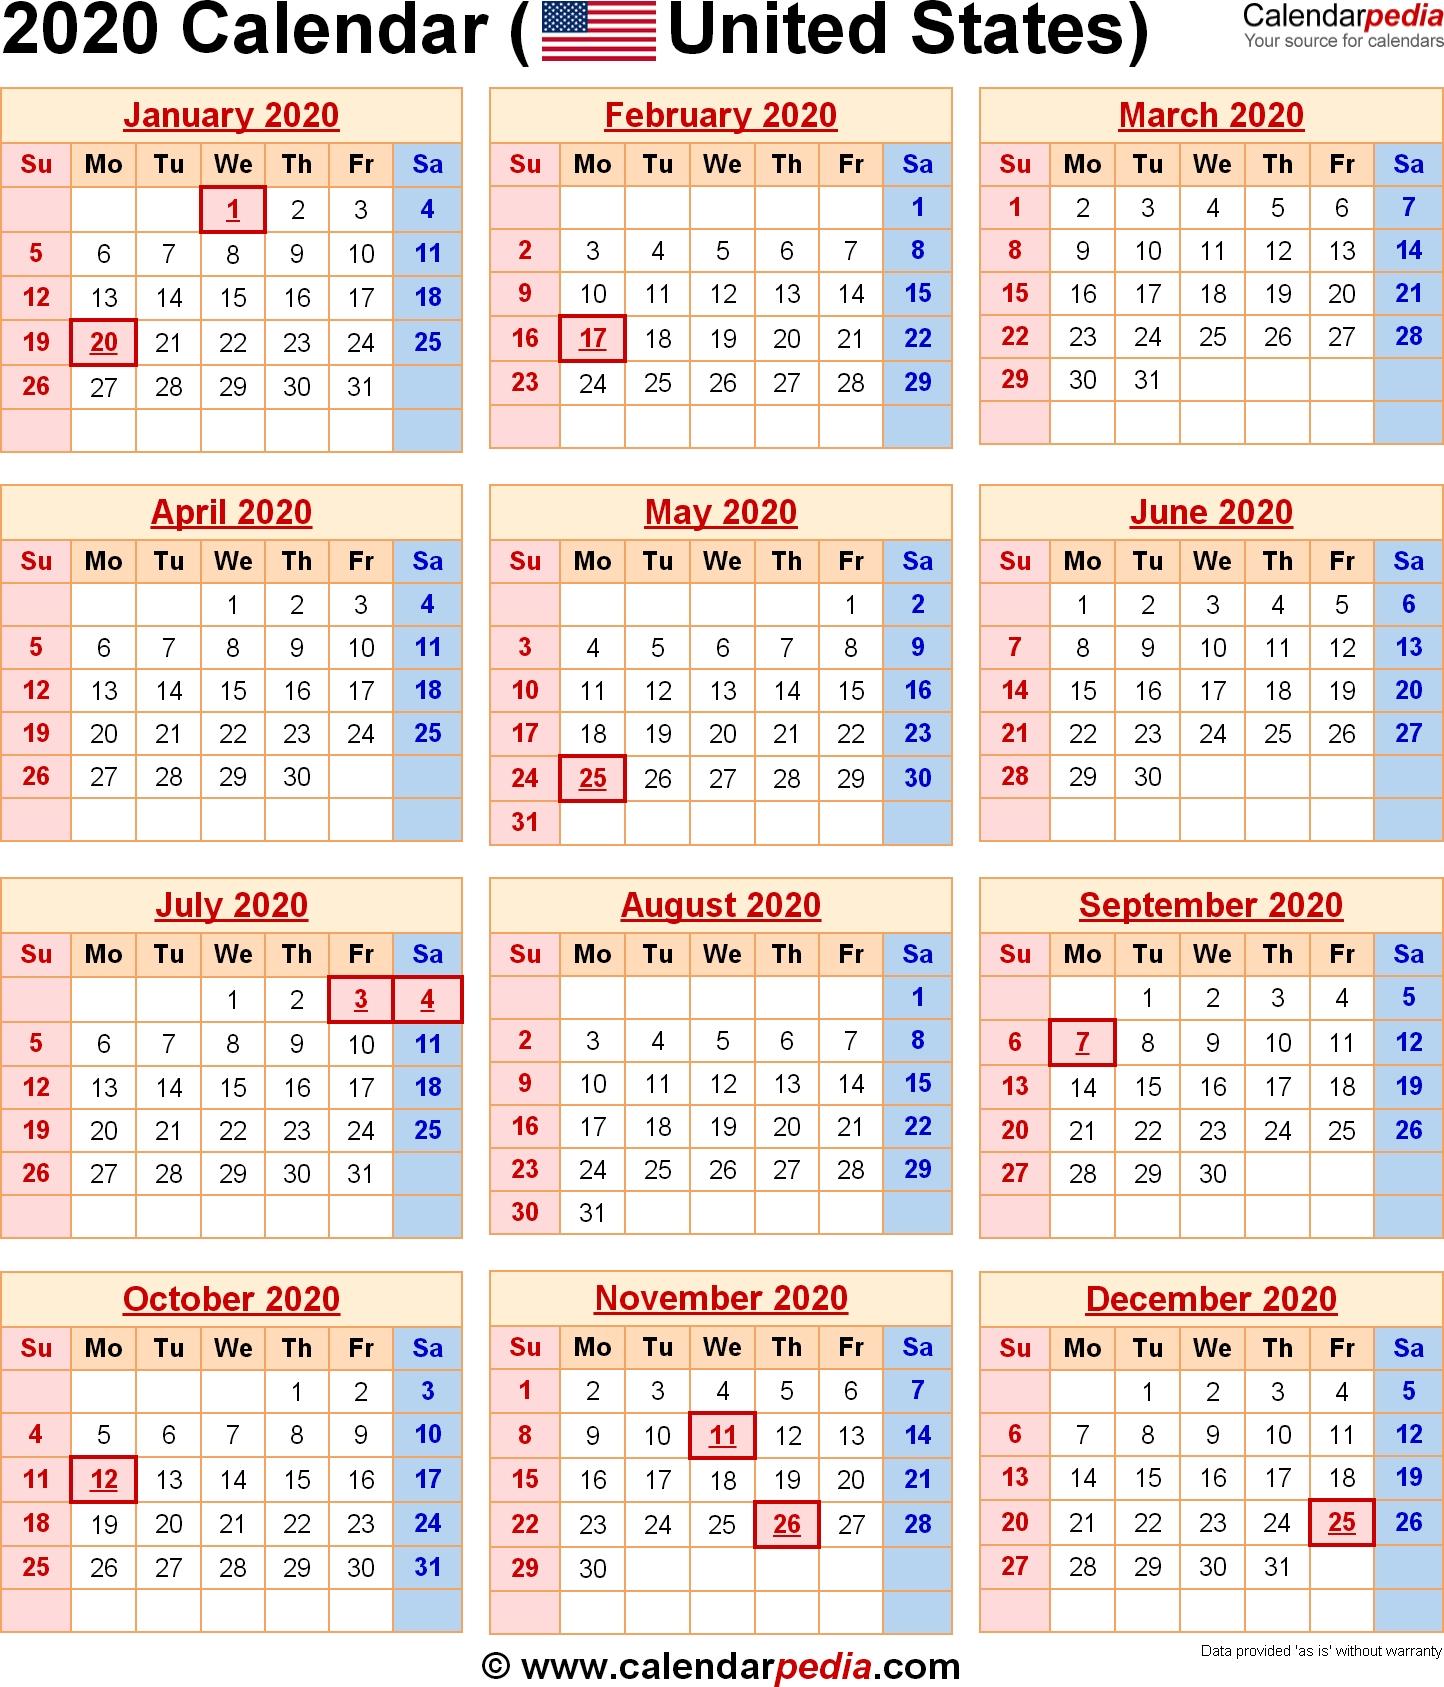 2020 Calendar With Federal Holidays & Excel/pdf/word Templates inside National Day Calendar 2020 Printable